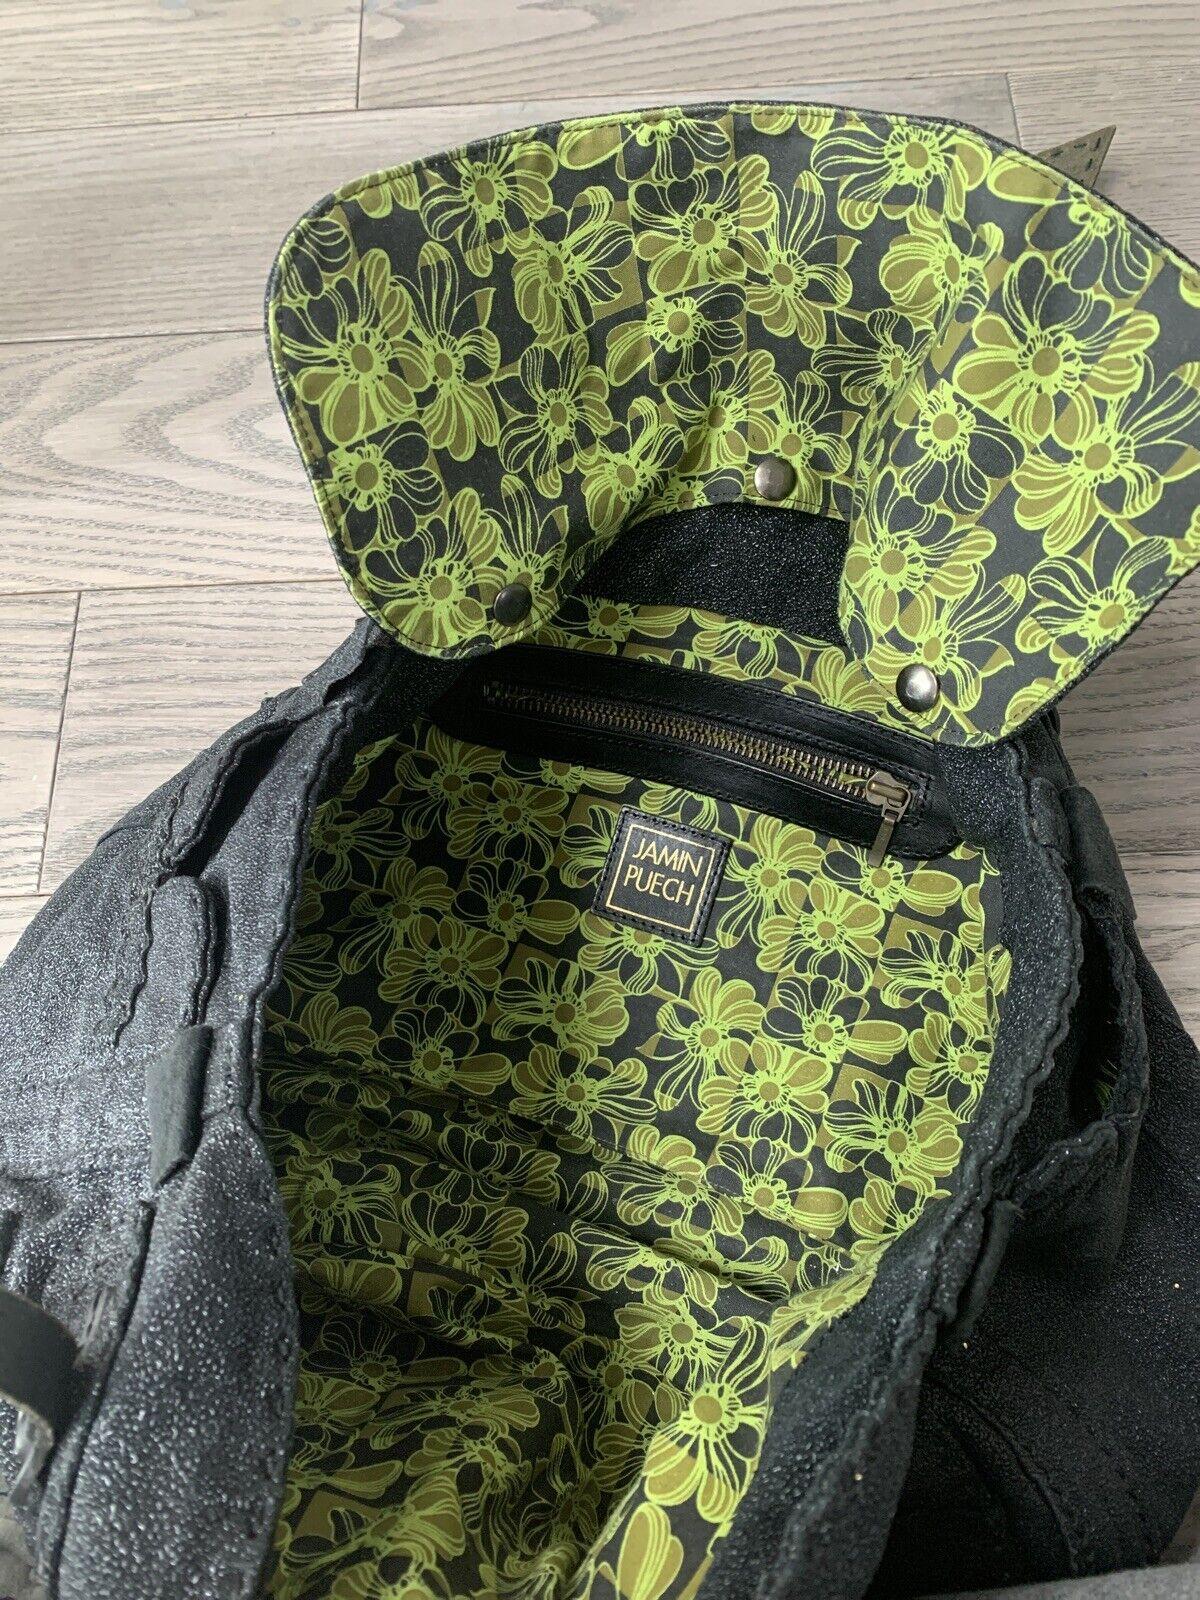 jamin puech handbags - image 5